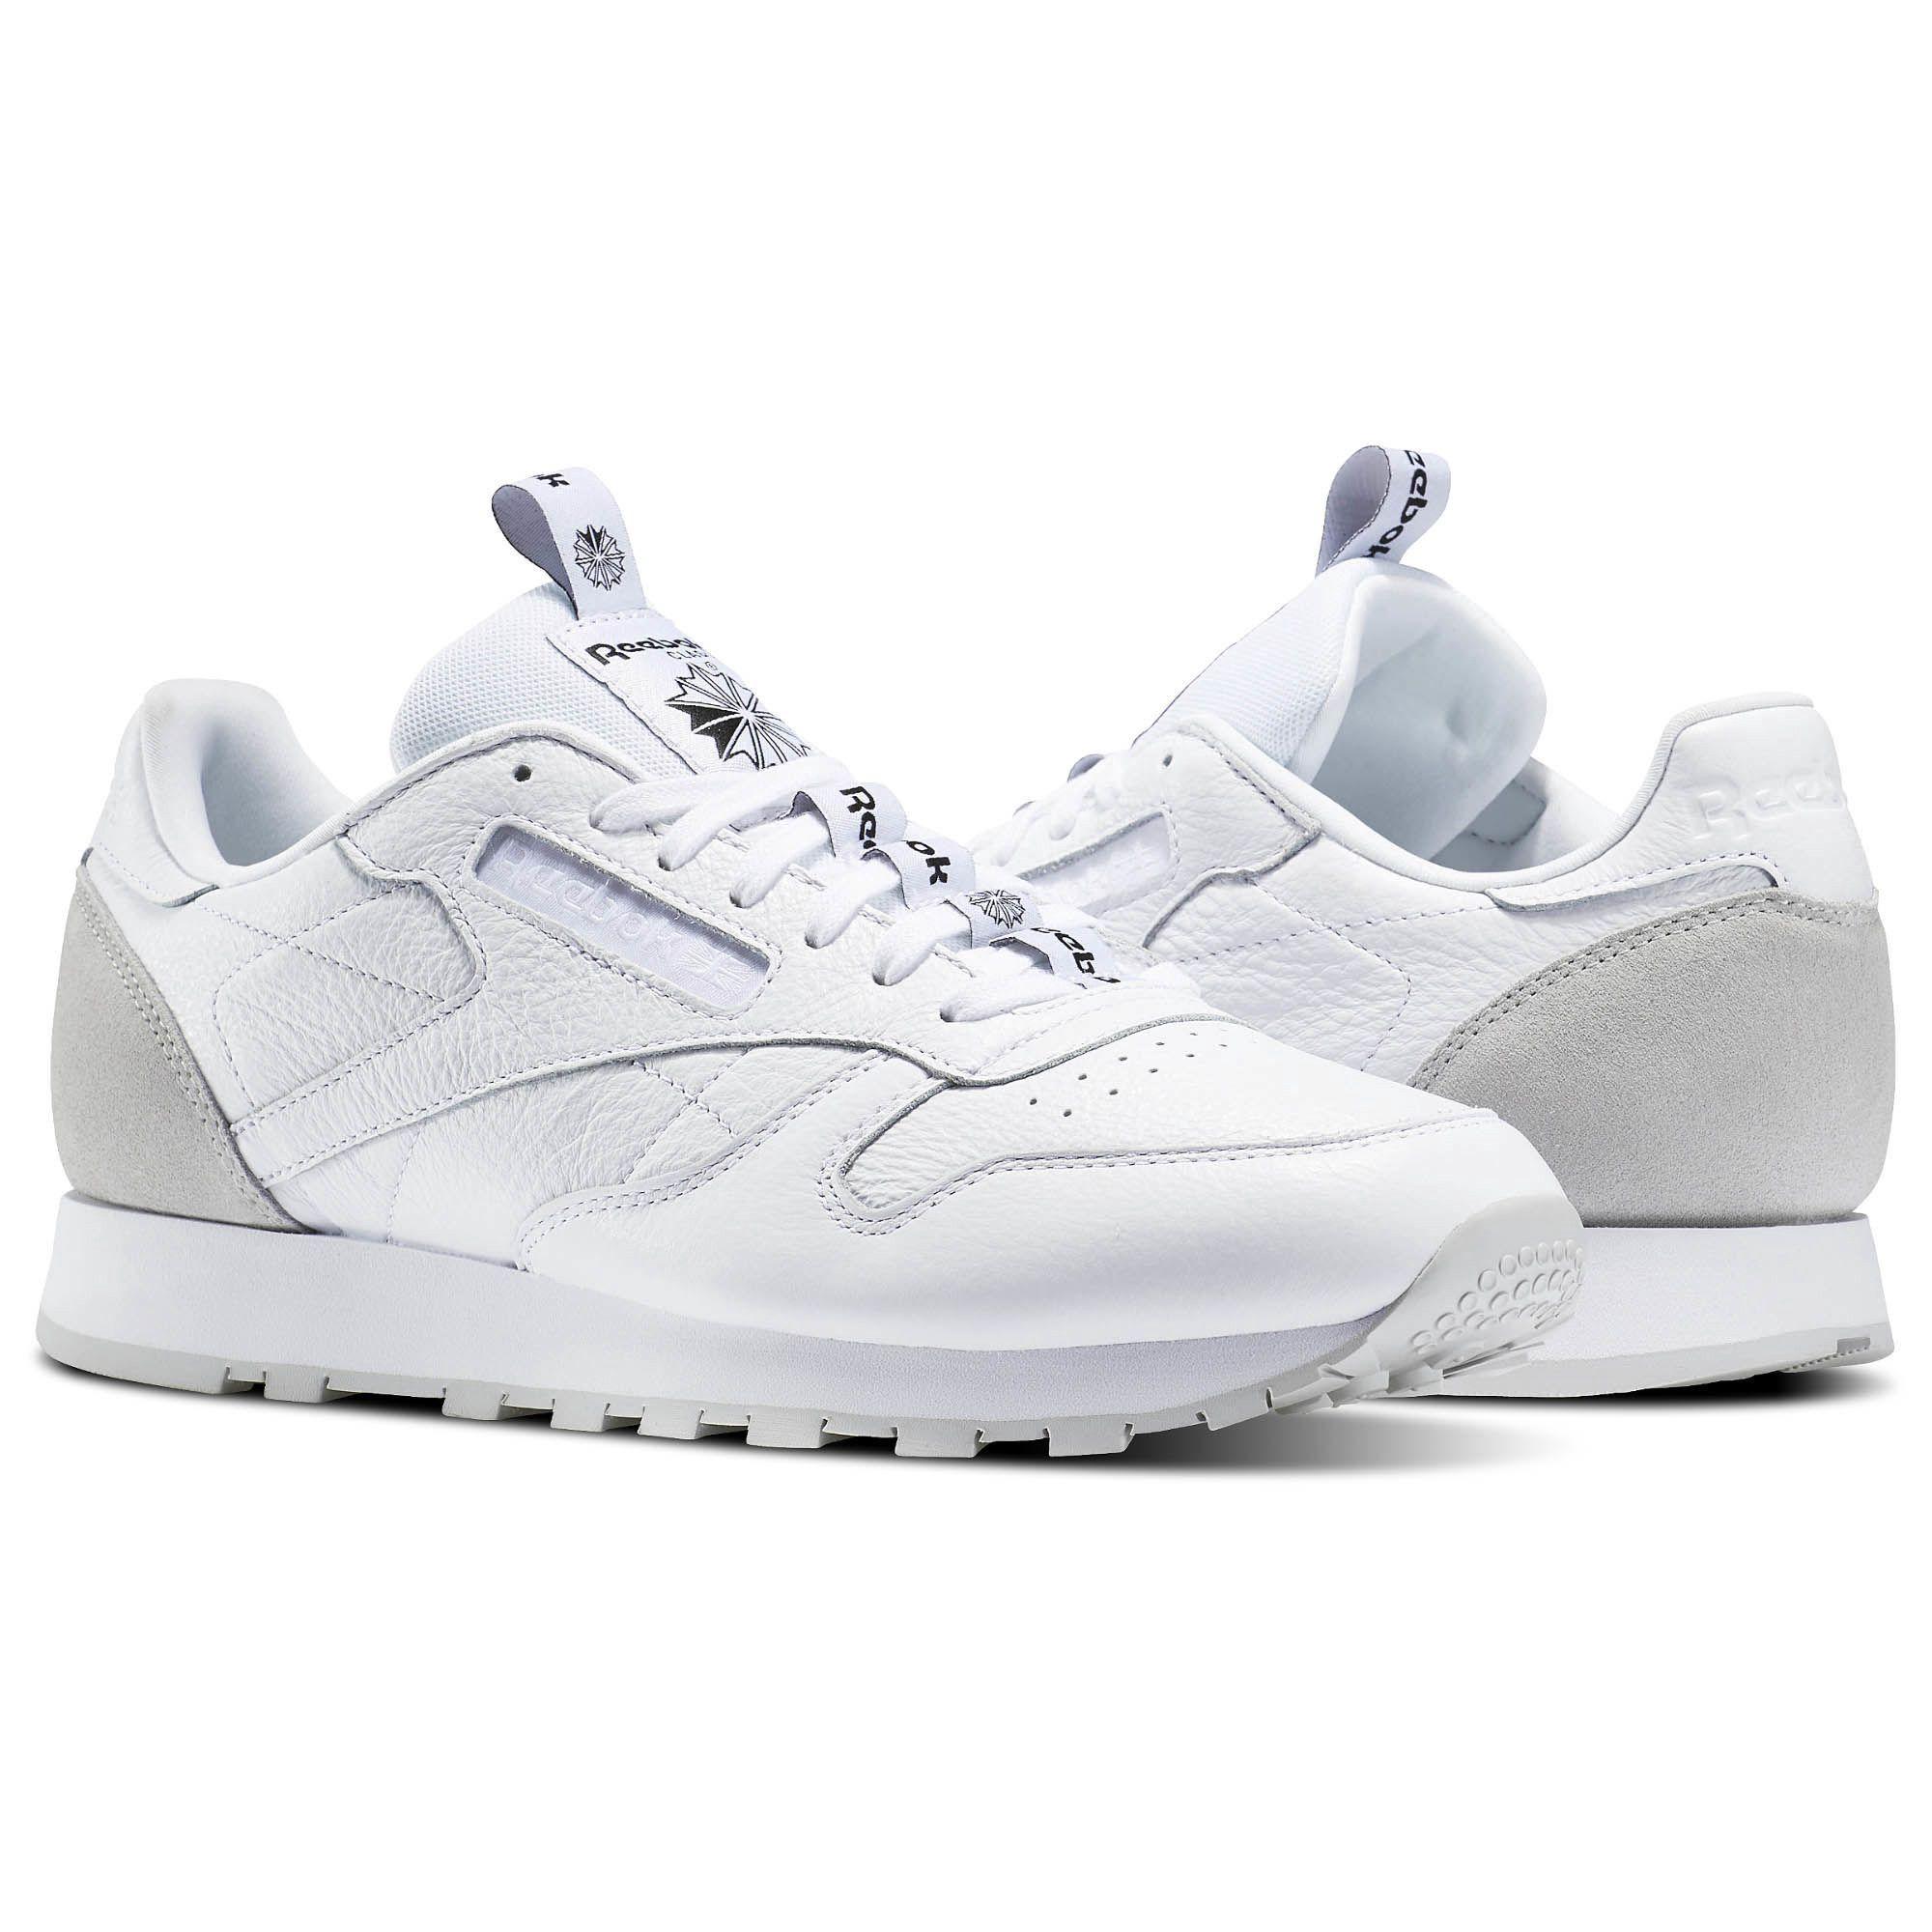 73ac3a7716d1 REEBOK Classic Leather IT.  reebok  shoes